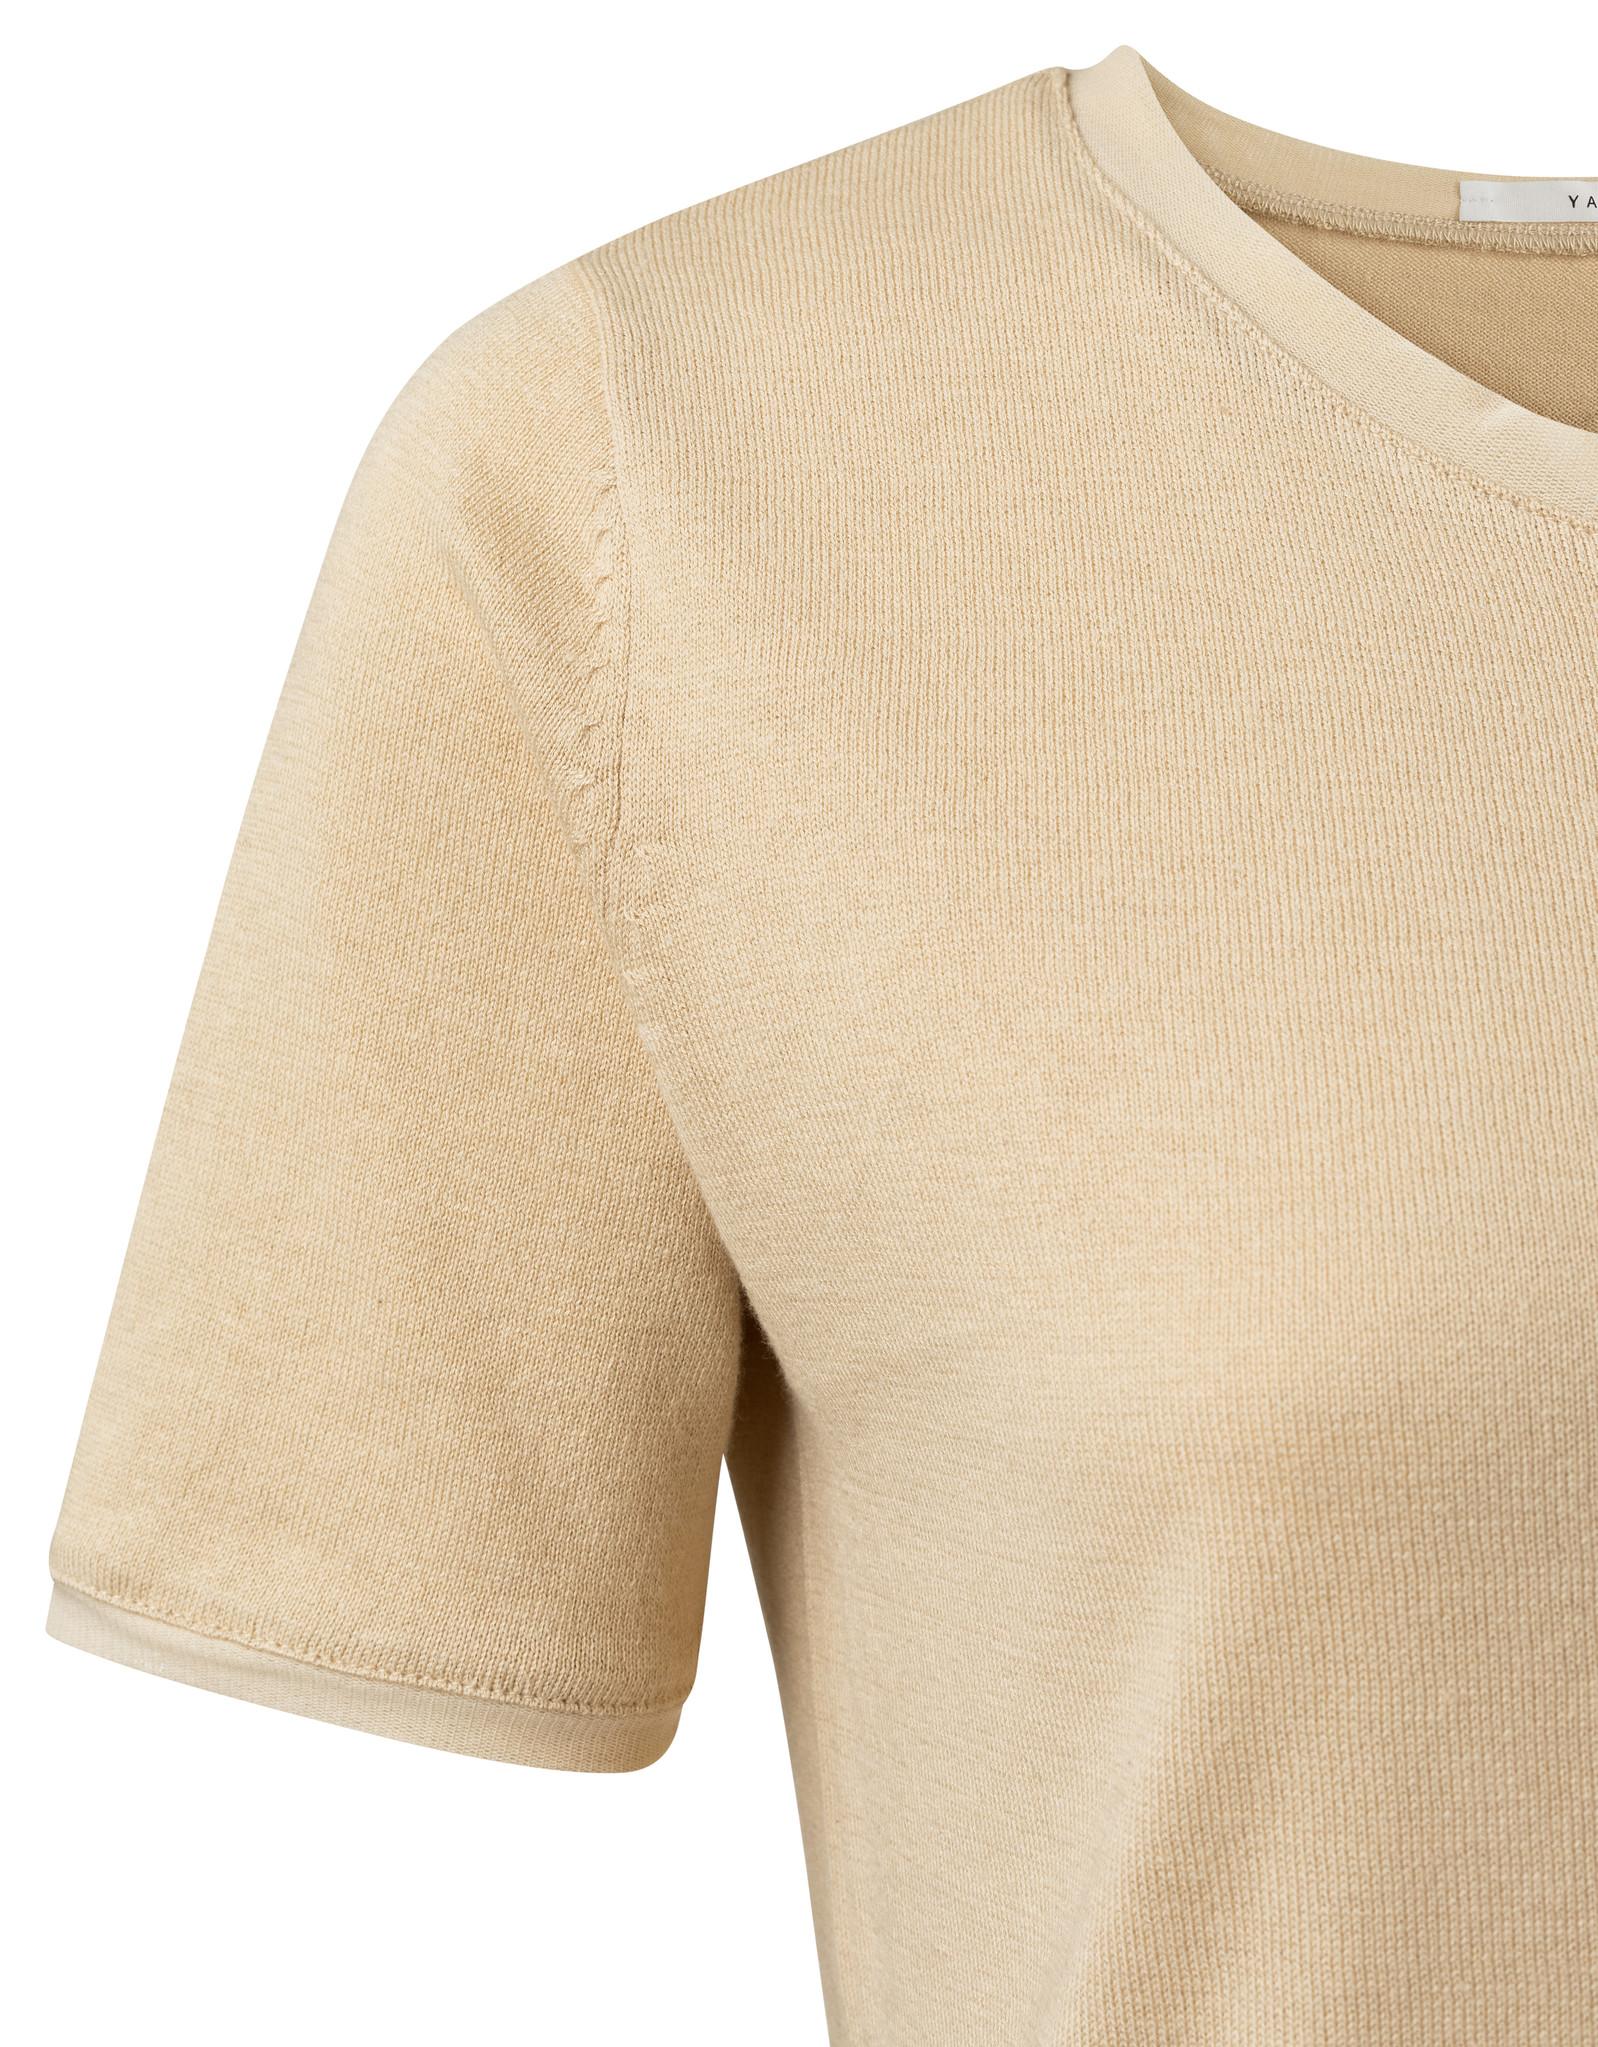 yaya Mesh binding sweater 1000412-112-2